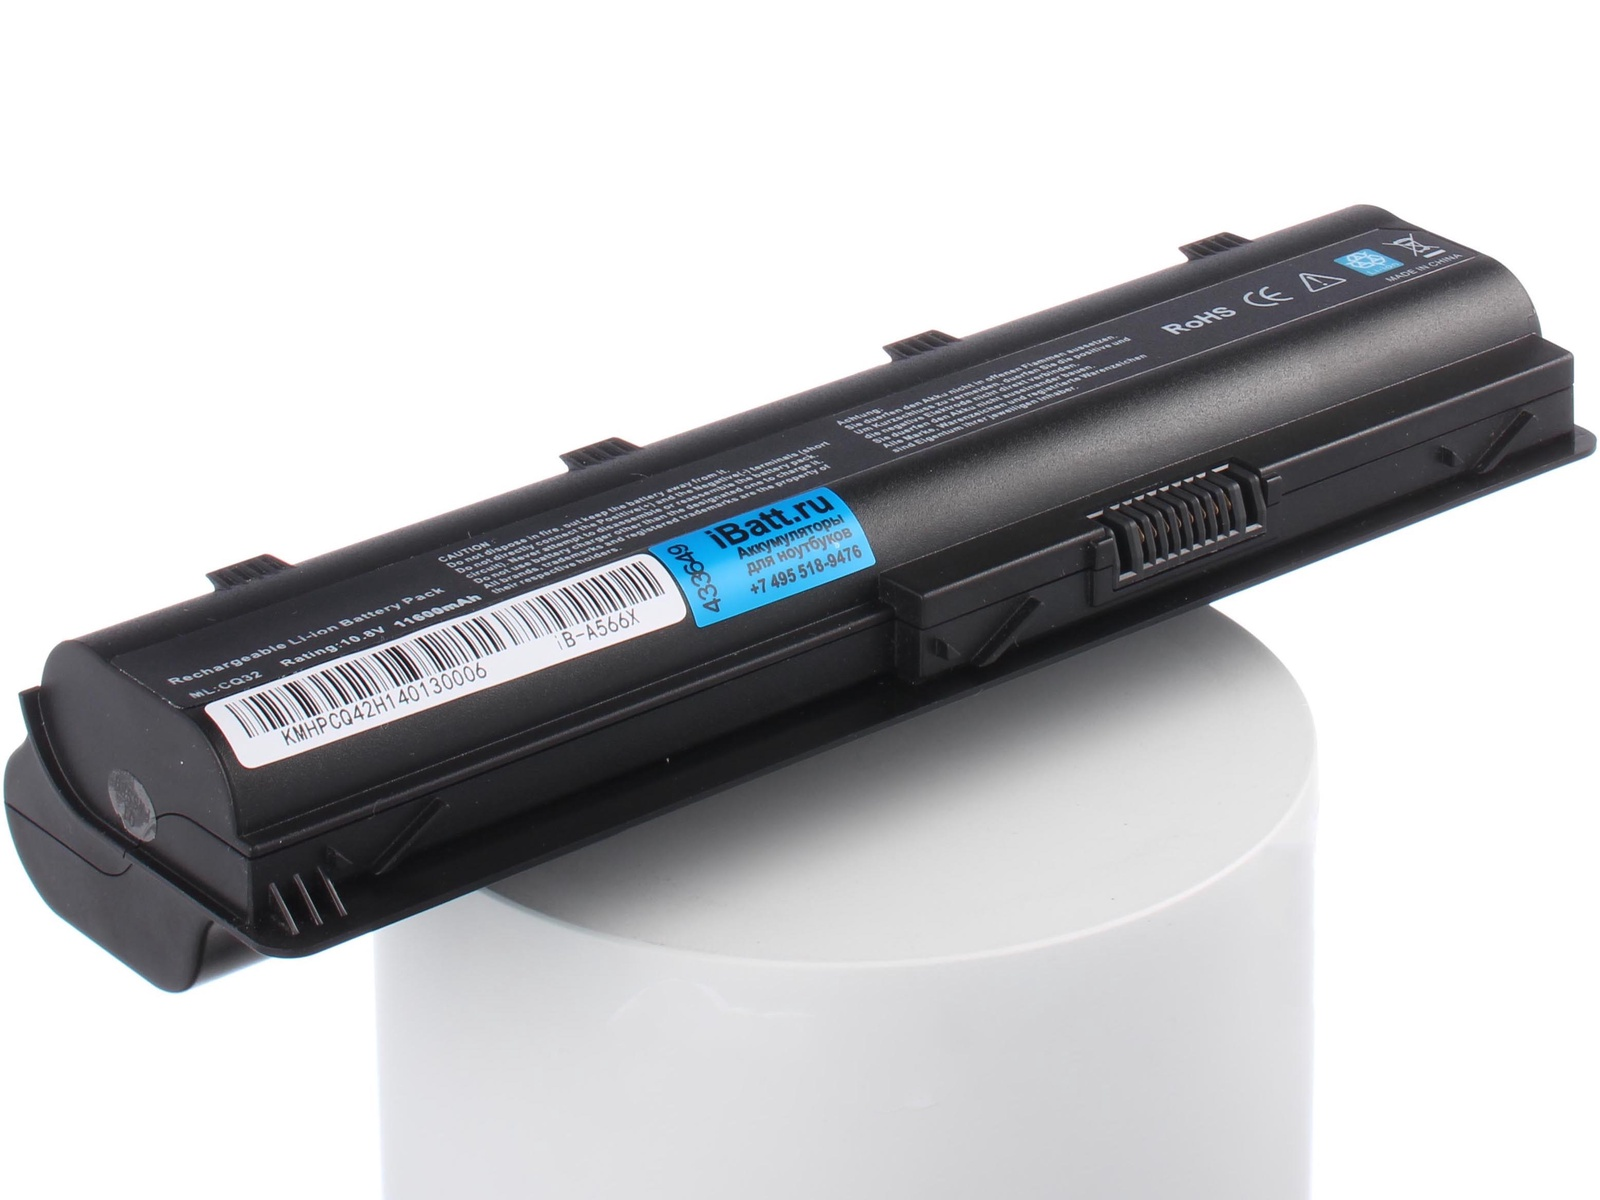 Аккумулятор для ноутбука iBatt для HP-Compaq Pavilion dv6-6101er, Pavilion dv6-6159er, Pavilion g6-2211sr, Pavilion DV7-6000, G62-450ER, Pavilion dv6-3056er, Pavilion dv6-6152er, Pavilion g6-2355sr, Pavilion g6-2209sr, G62-b21ER 665345 001 laptop motherboard 5% off sales promotion fulltested dv6 6000